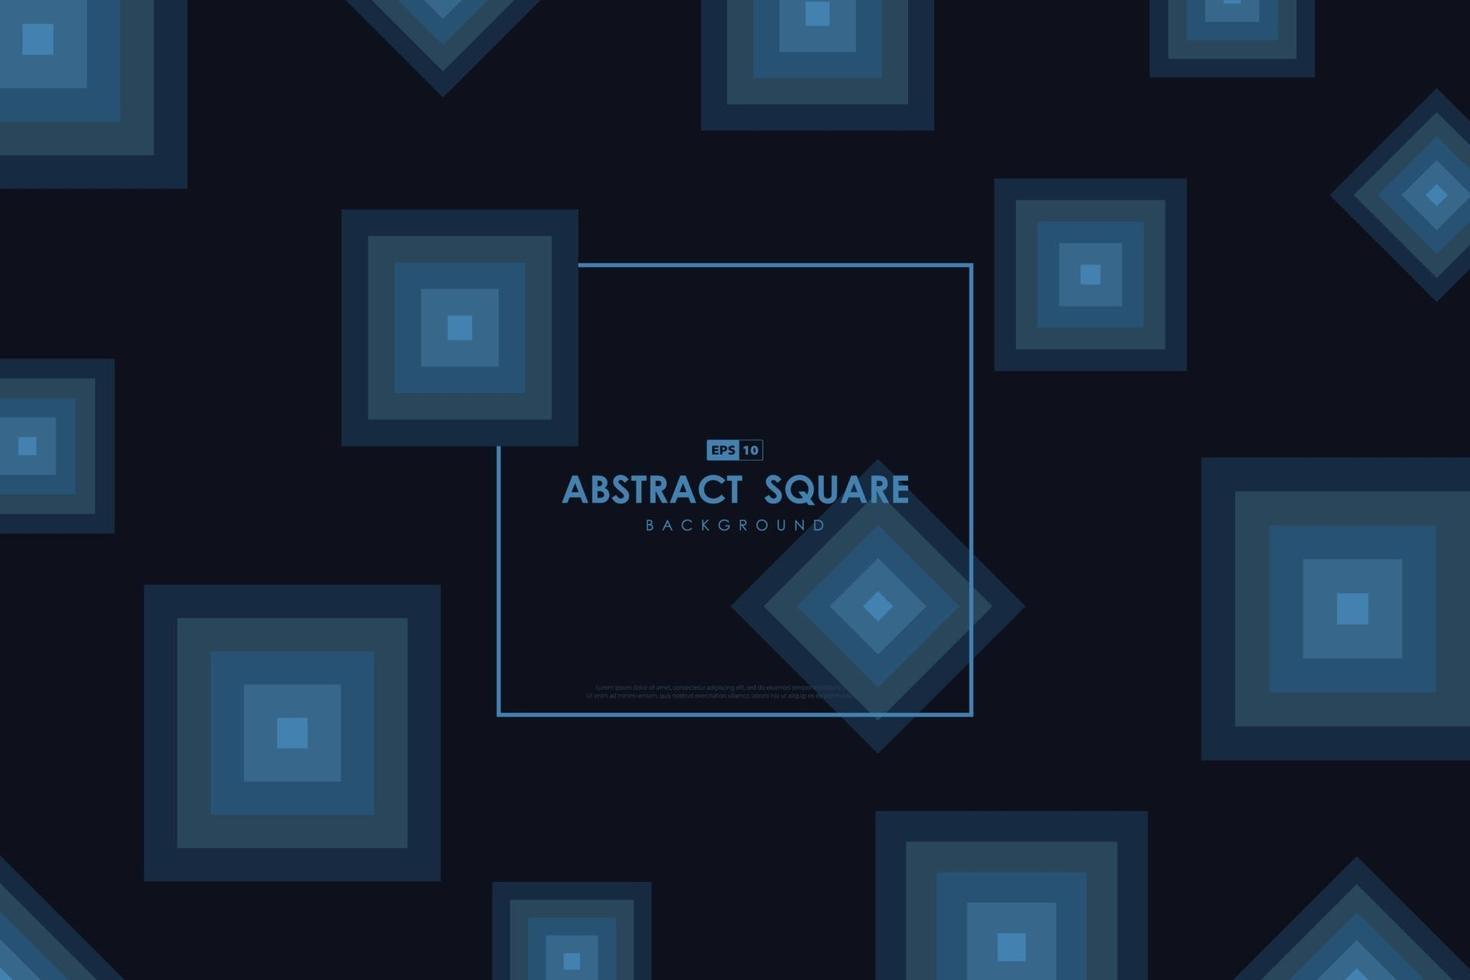 abstrakt blå minimal kvadratisk mönster konstverk affisch design bakgrund. illustration vektor eps10